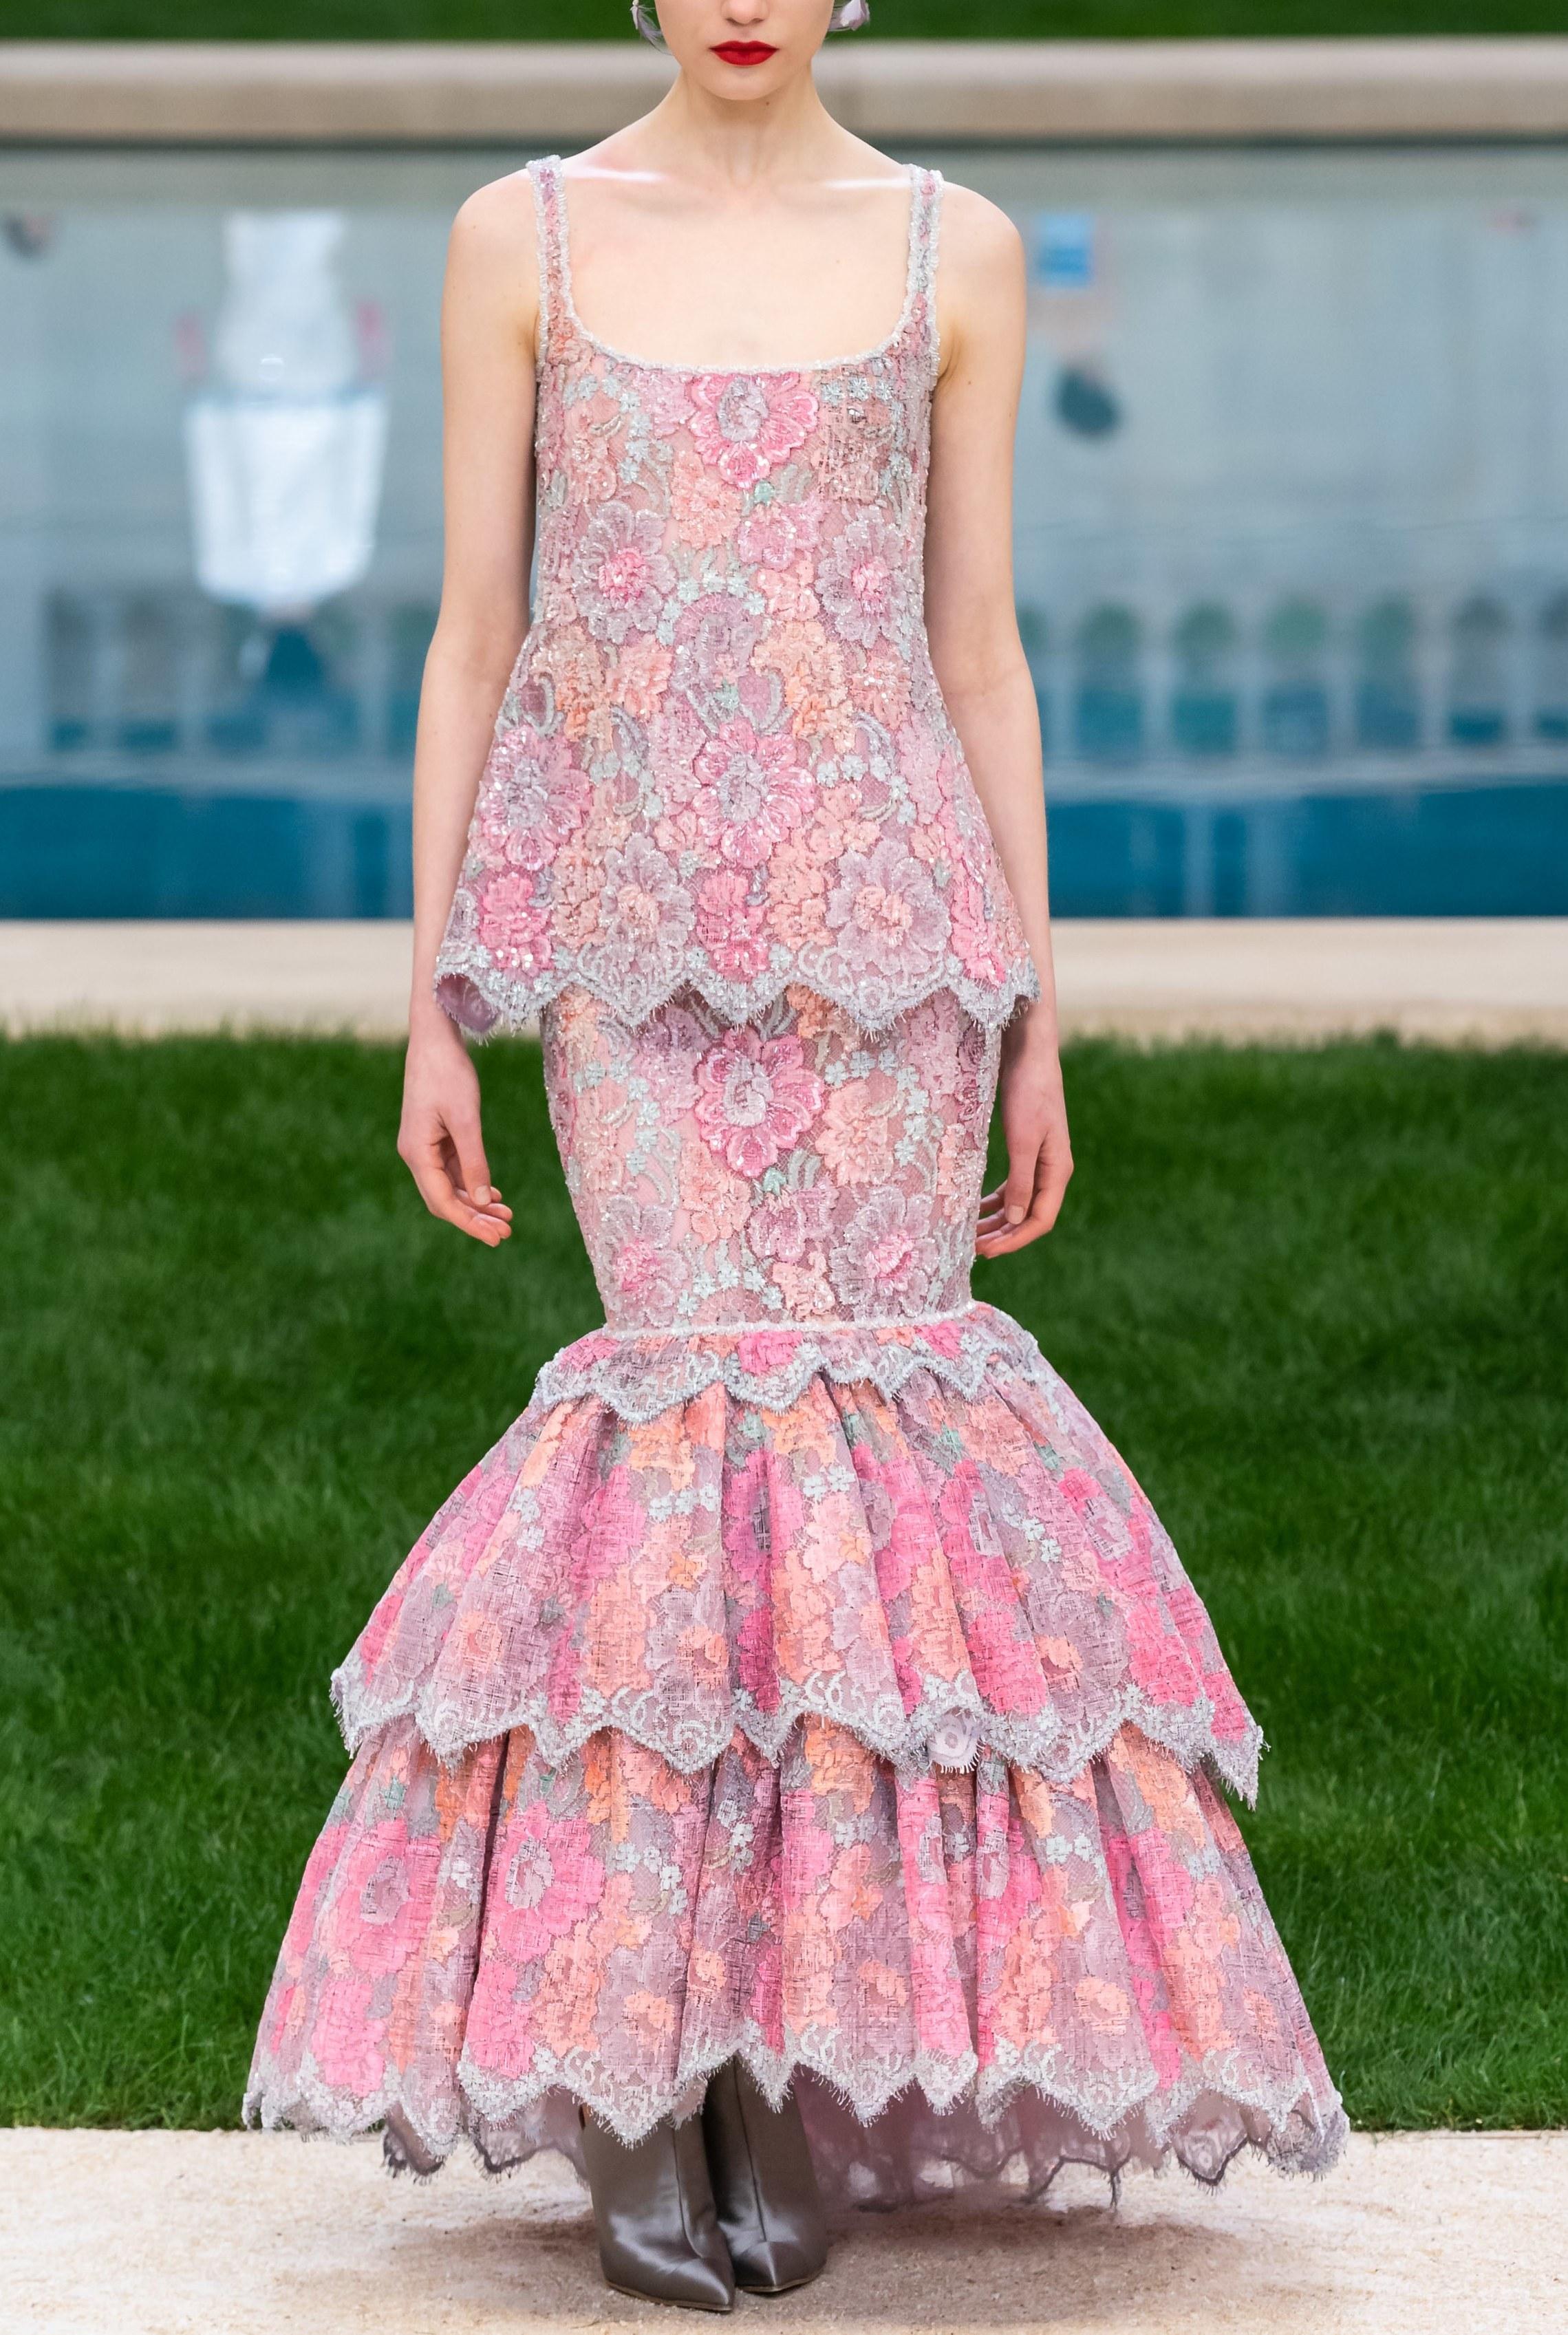 roz-bleu-pastel-moda-2019